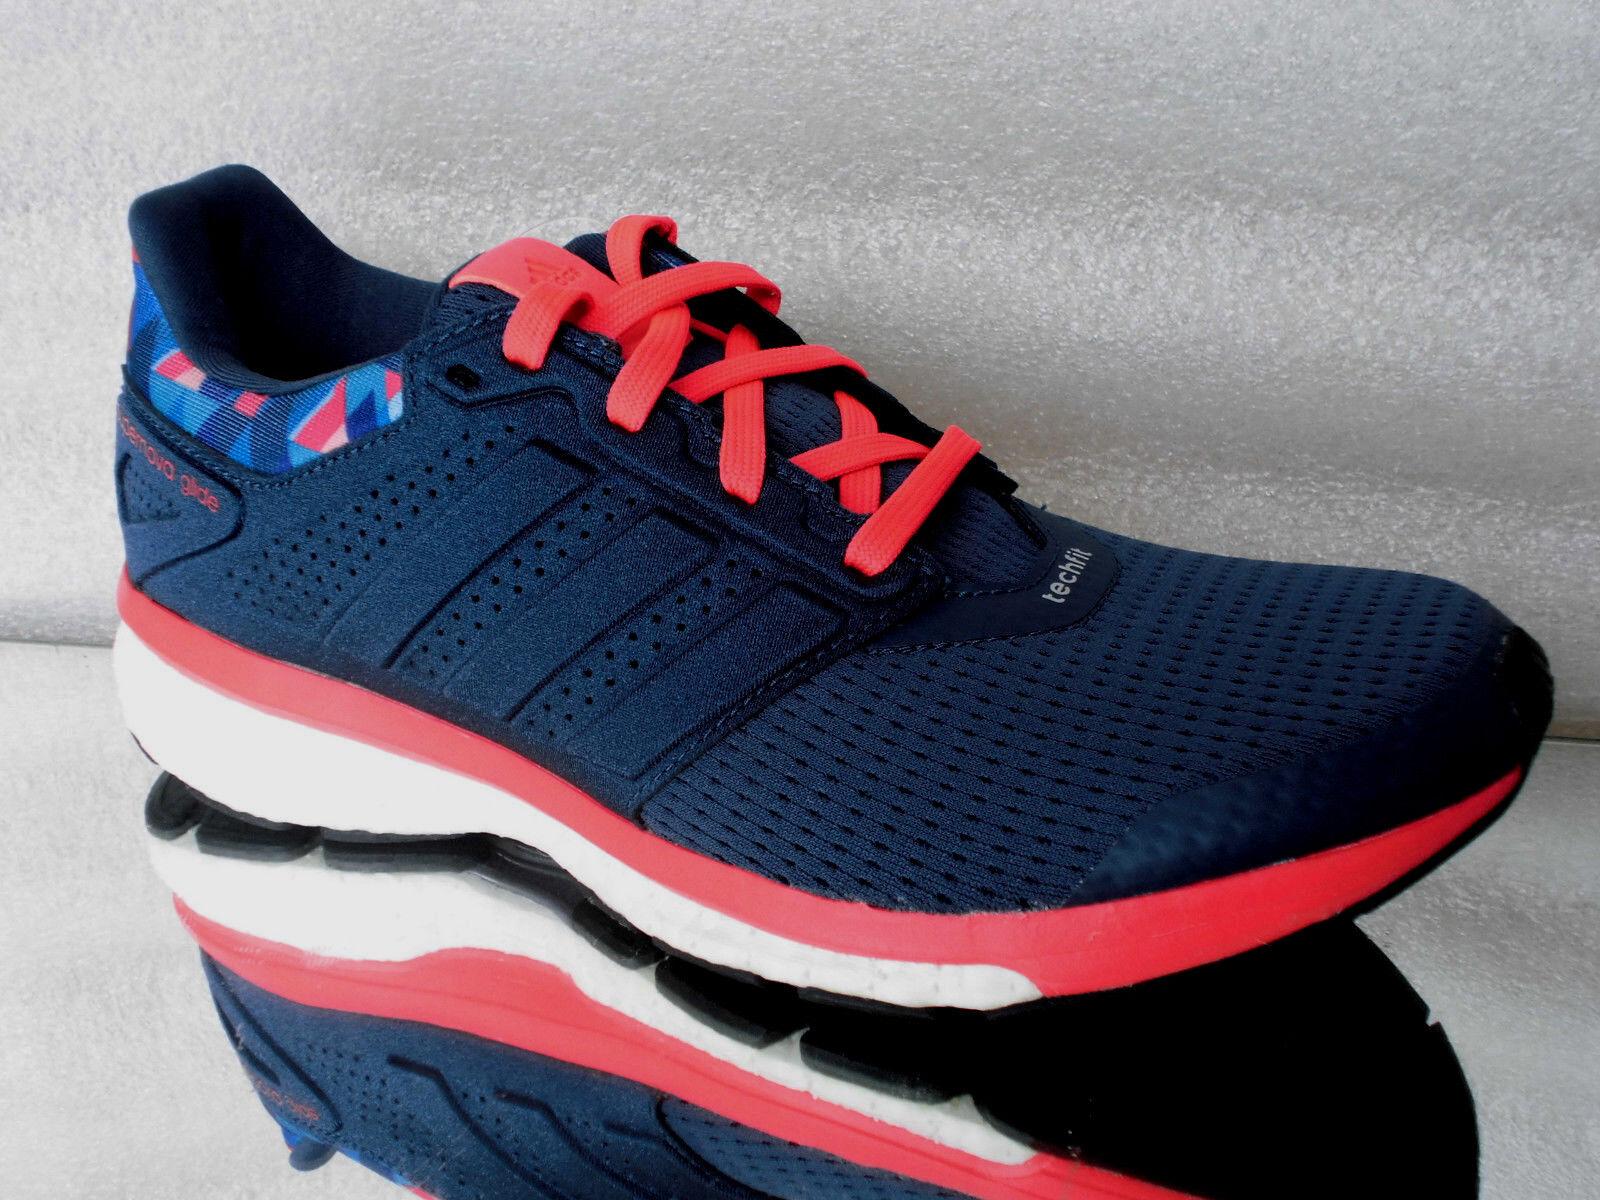 ADIDAS W Supernova glide 8 gmx W ADIDAS AQ5059 Fitness-& Lauf Turnschuhe Sneaker Blau NEU 175ef1